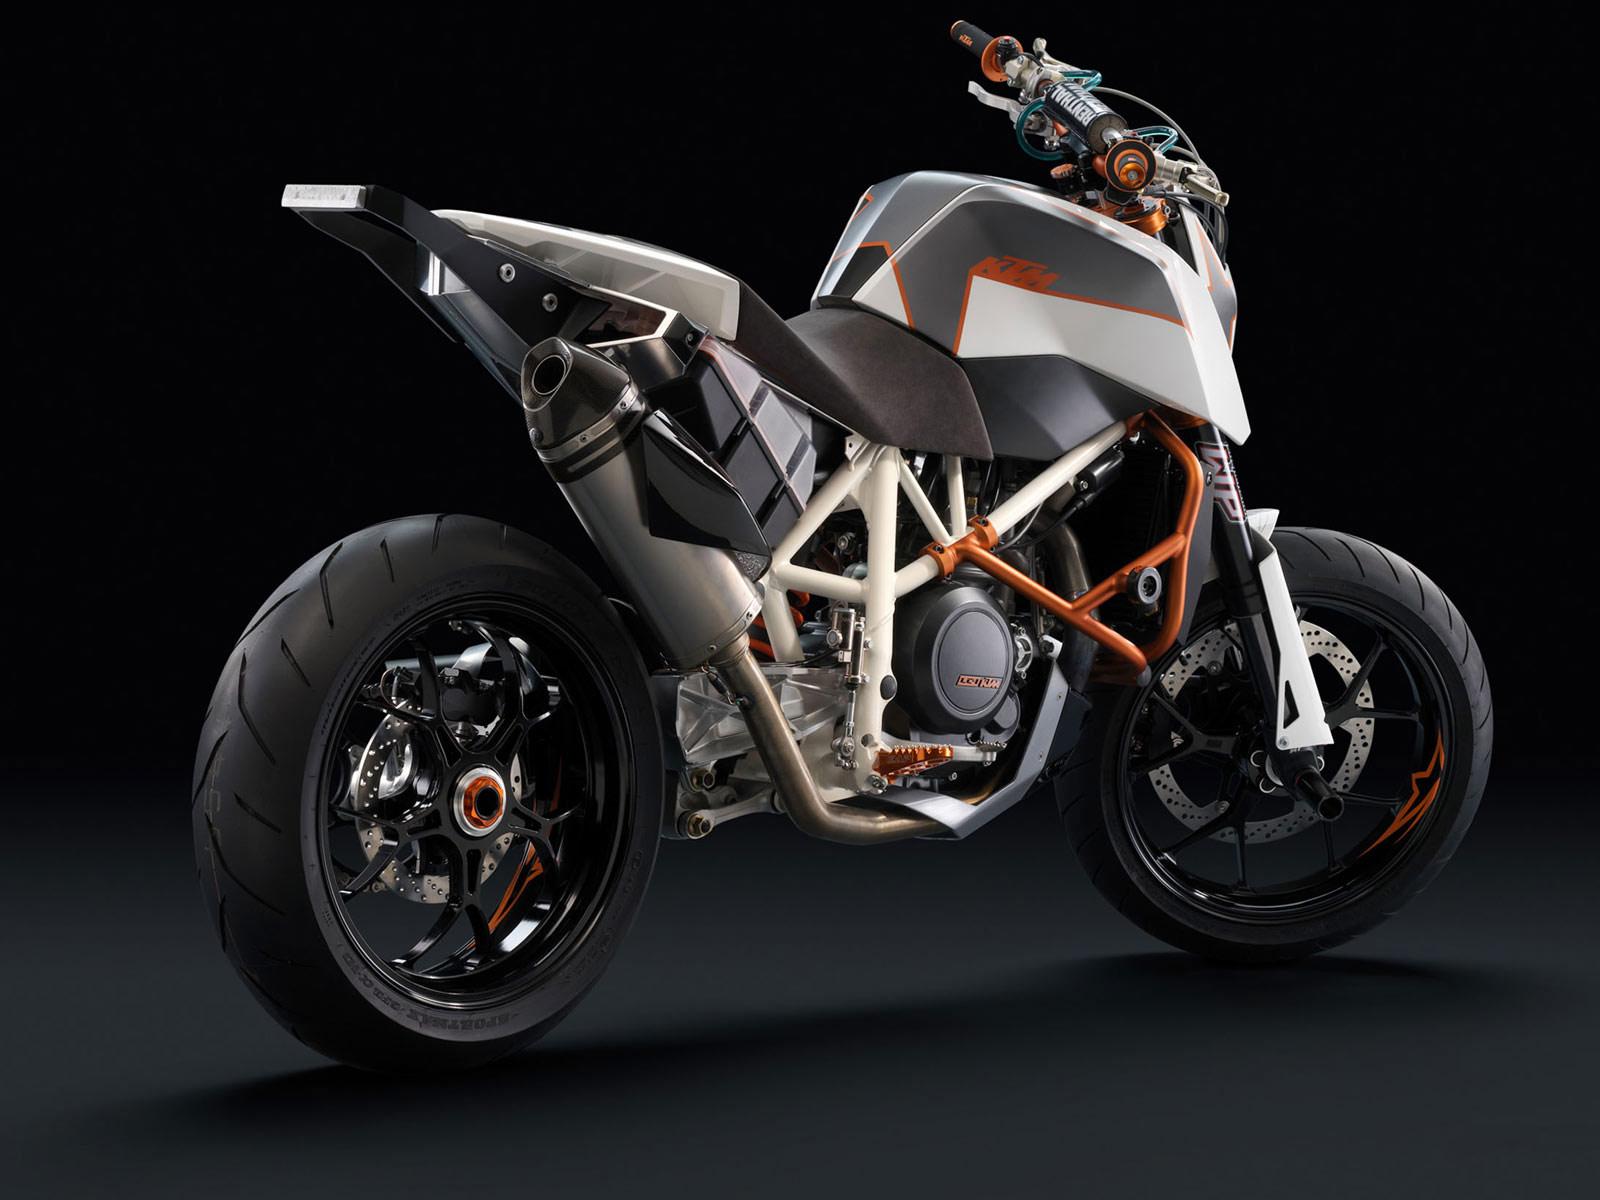 http://2.bp.blogspot.com/-ftdKMhf0ZSg/Tnv2Yd8VCaI/AAAAAAAABO8/4dbMrCOm6Es/s1600/ktm_690_stunt_concept_2008-motorcycle-desktop-wallpaper_3.jpg